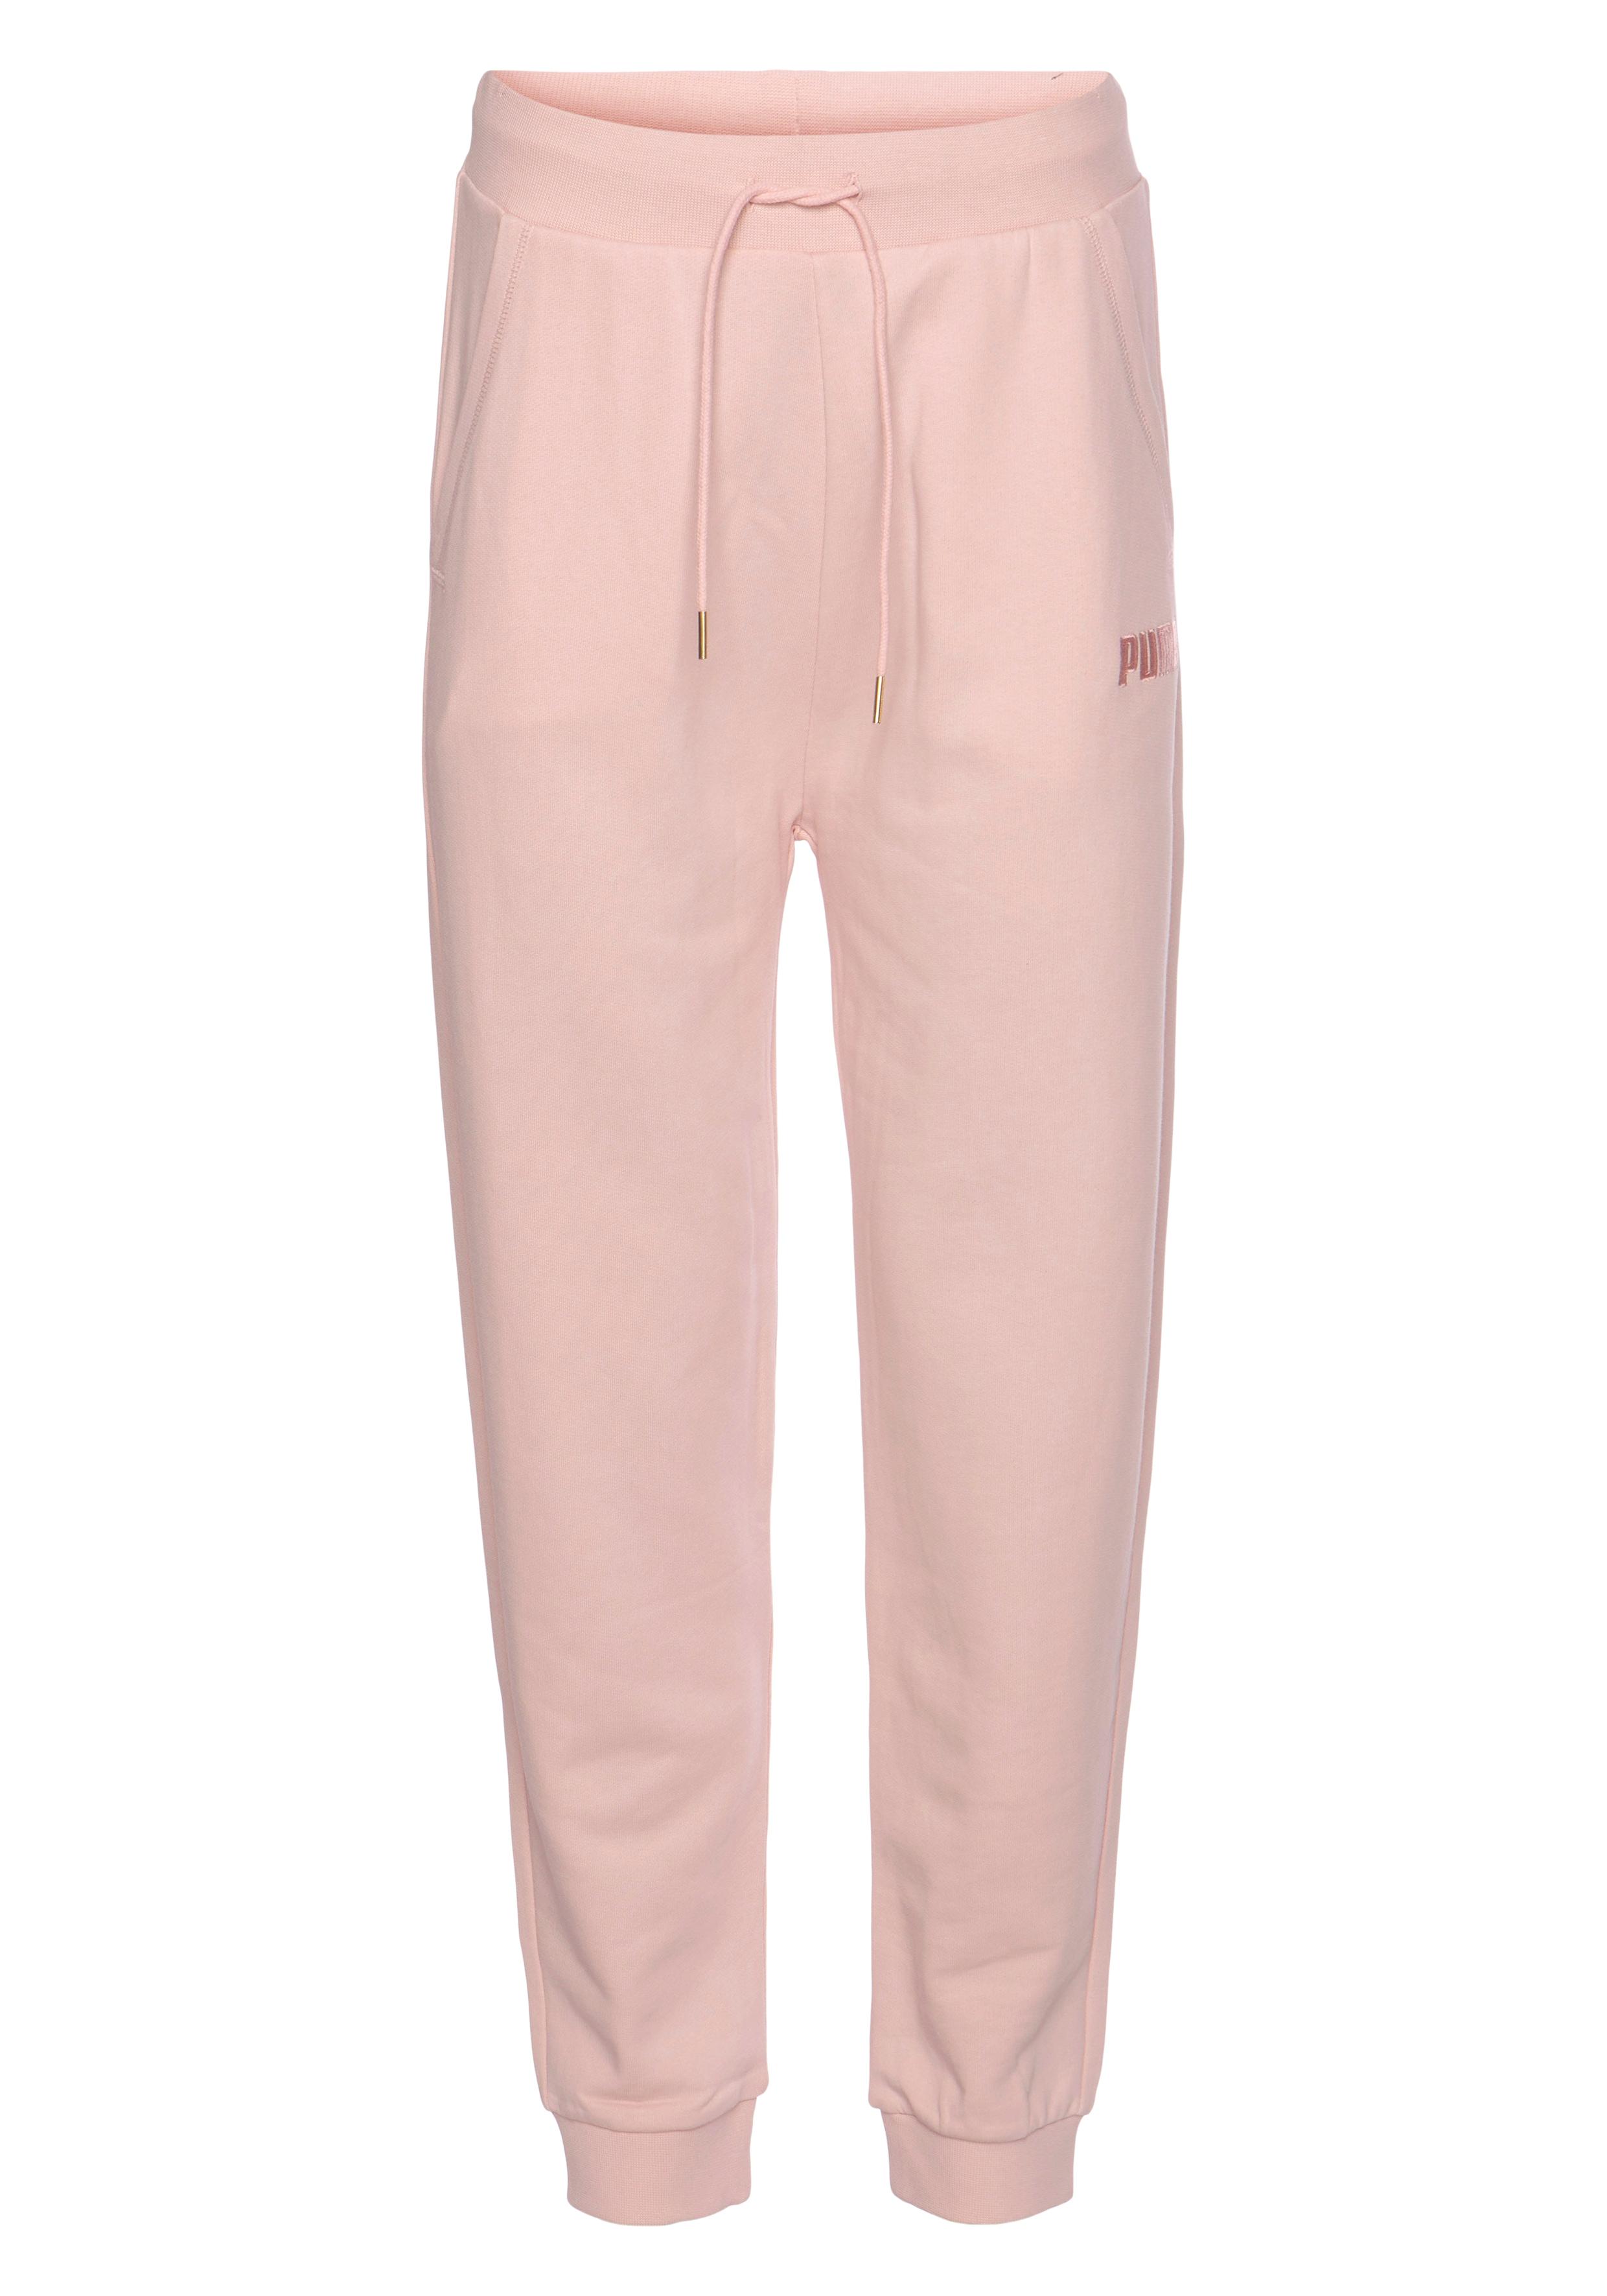 puma -  Jogginghose HER High Waist Pants TR cl